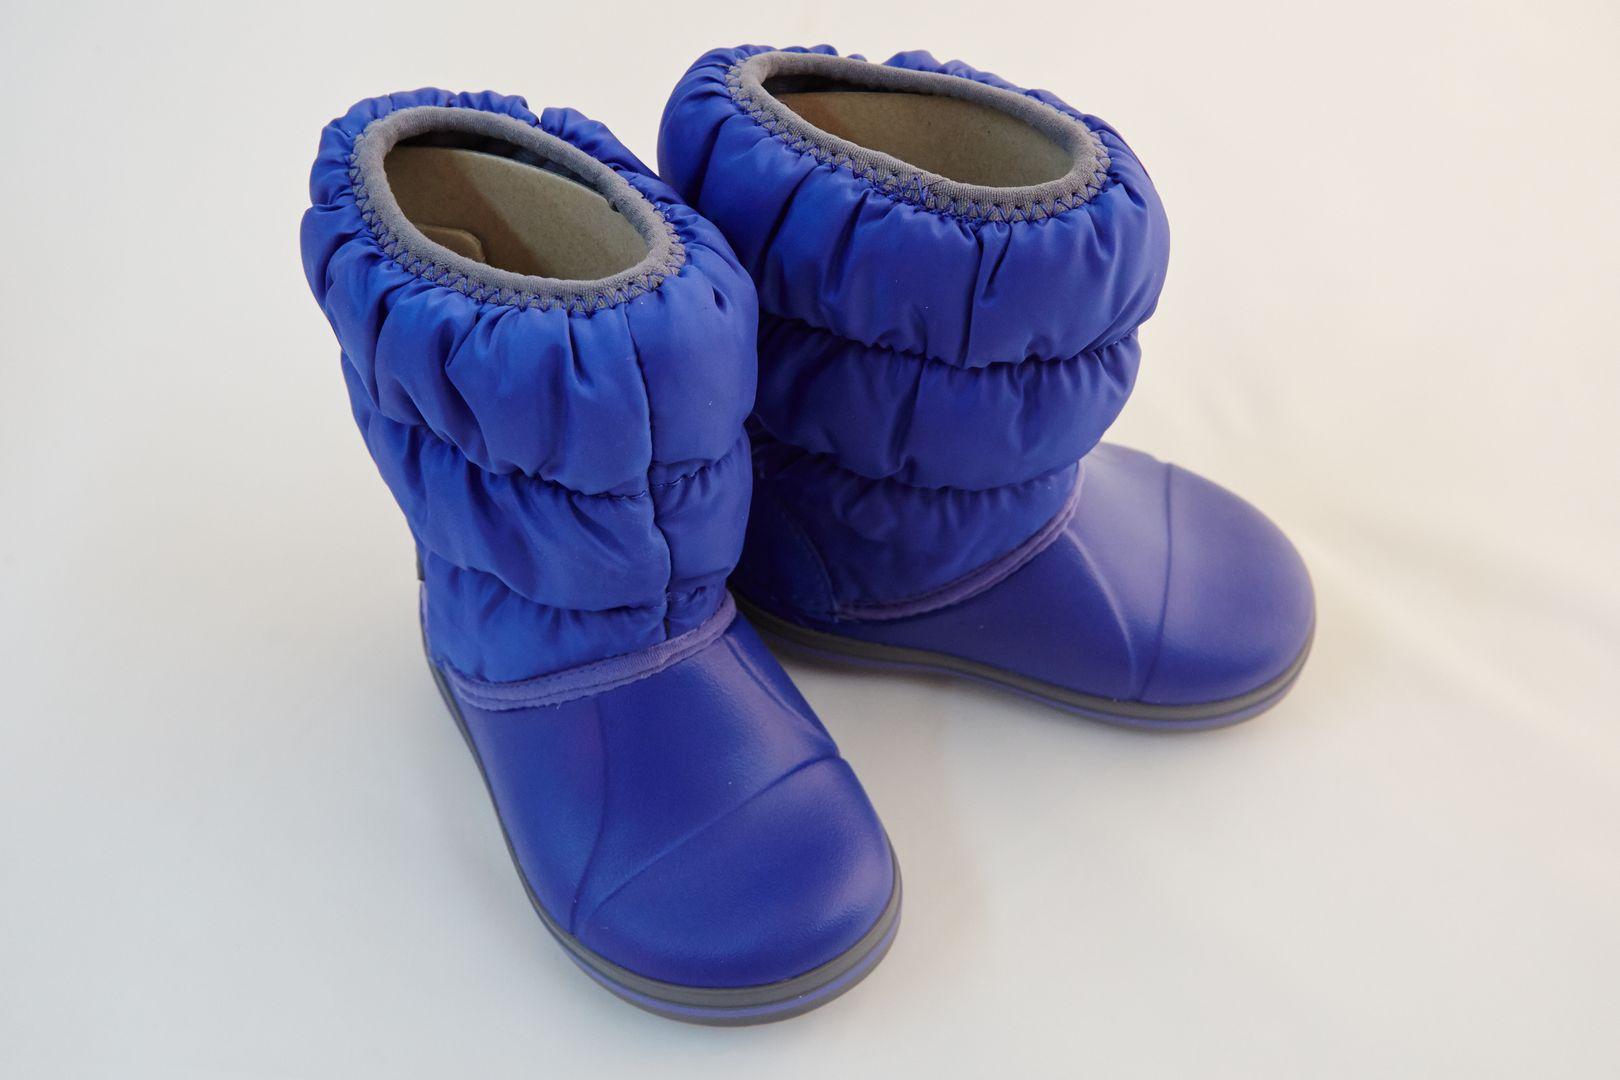 9f83f8c1475 Crocs παιδική γαλότσα για αγόρι - Click Clothes